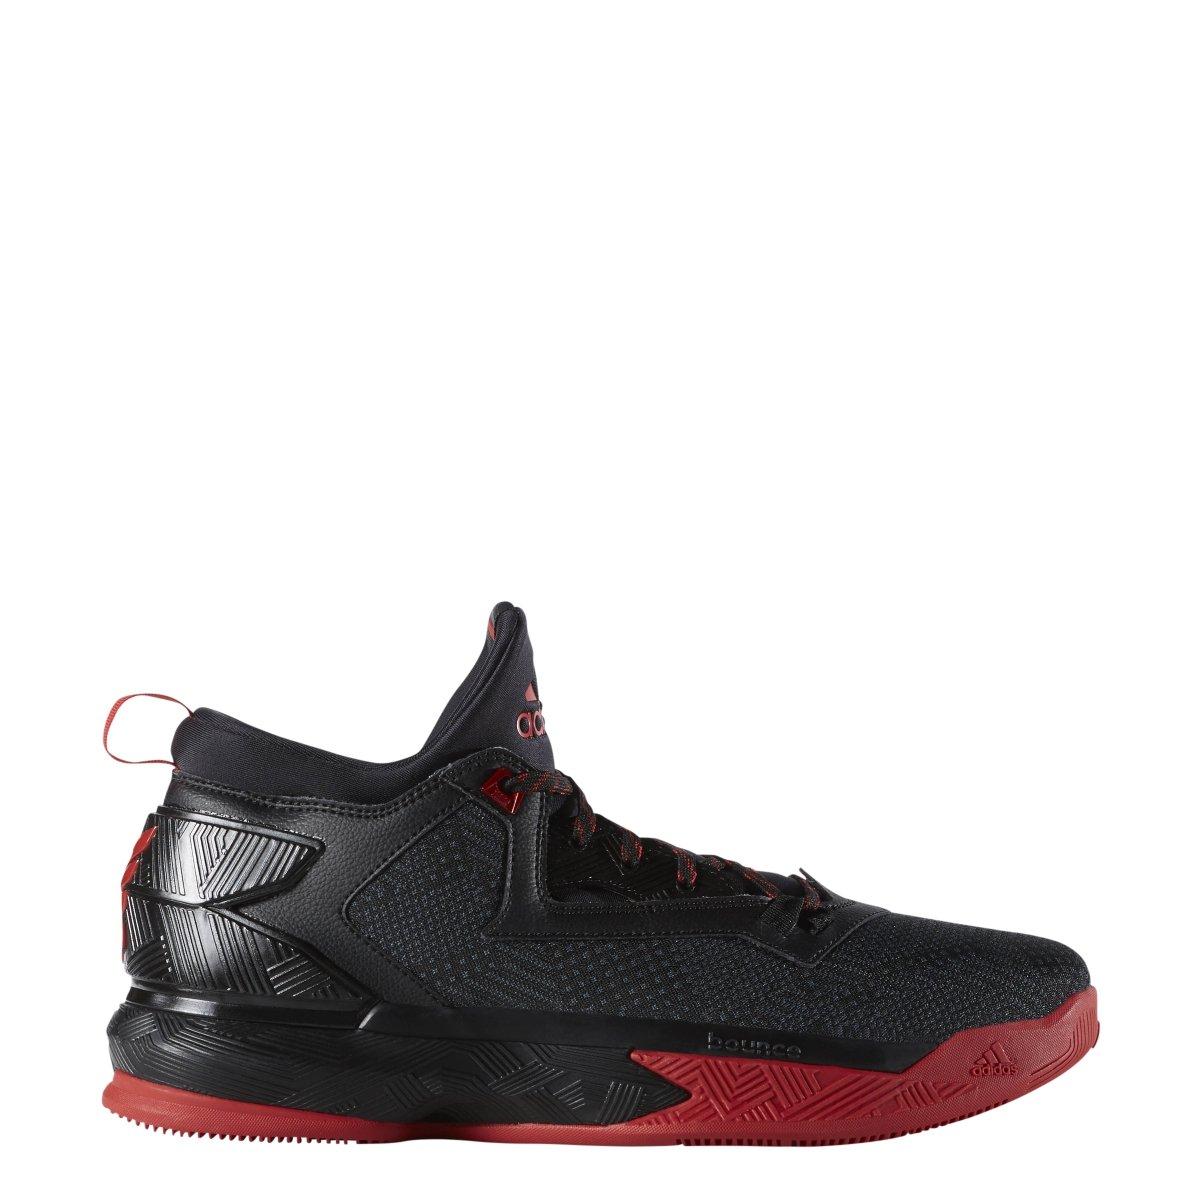 huge selection of f1757 cbcaf Amazon.com  adidas D Lillard 2 Mens Basketball Shoe  Basketb